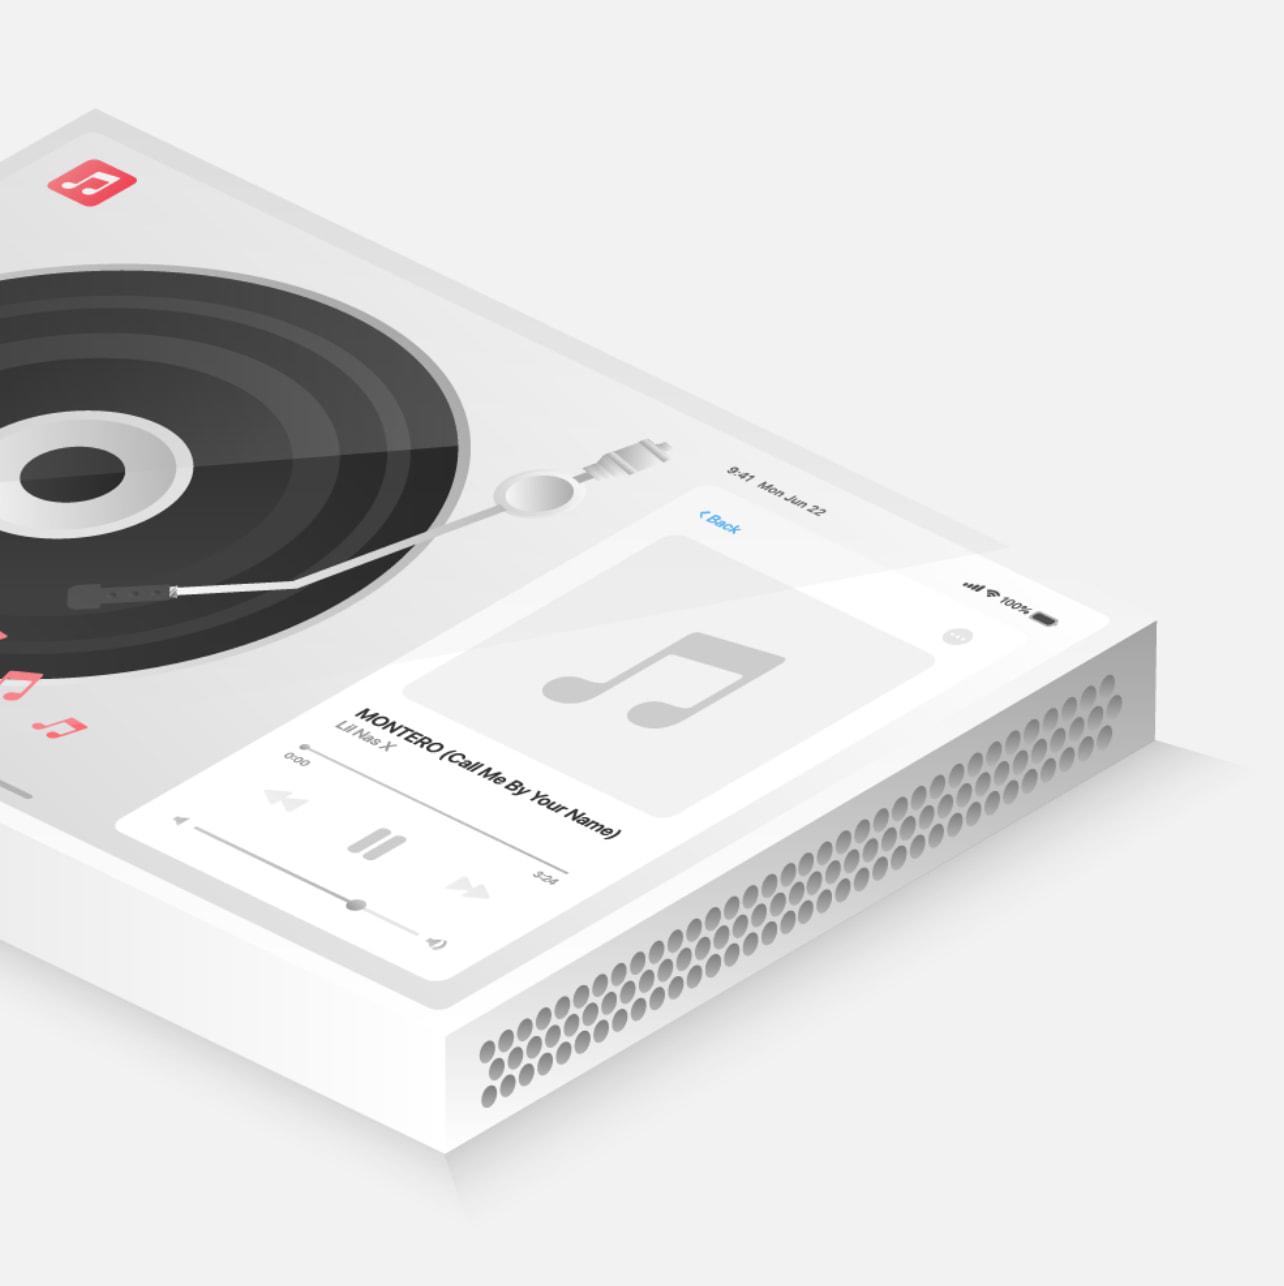 amy-jones-mackeeper-apple-concept-collection-vinyl-record-player@2x